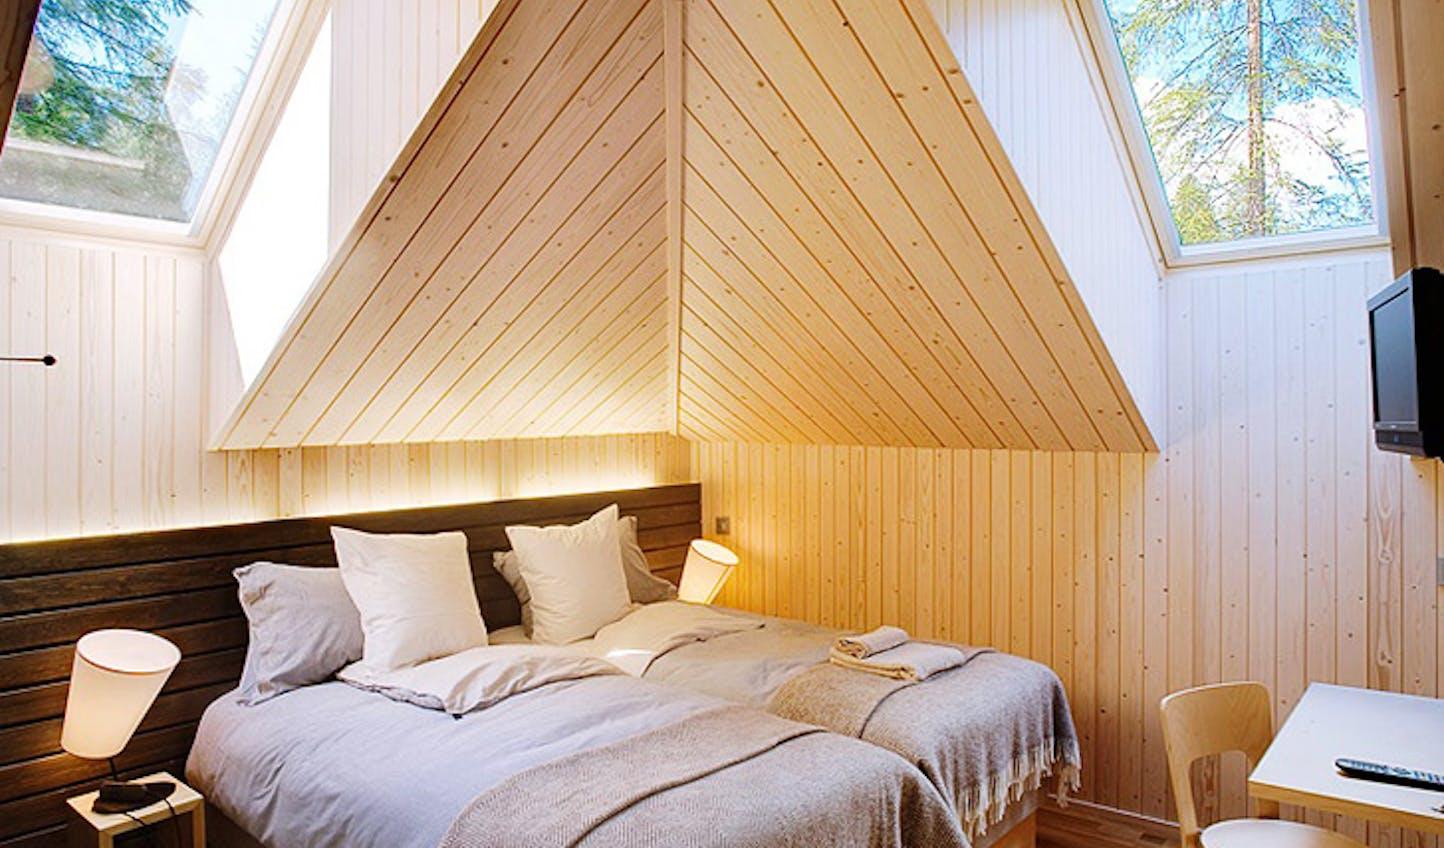 A villa bedroom, Finland